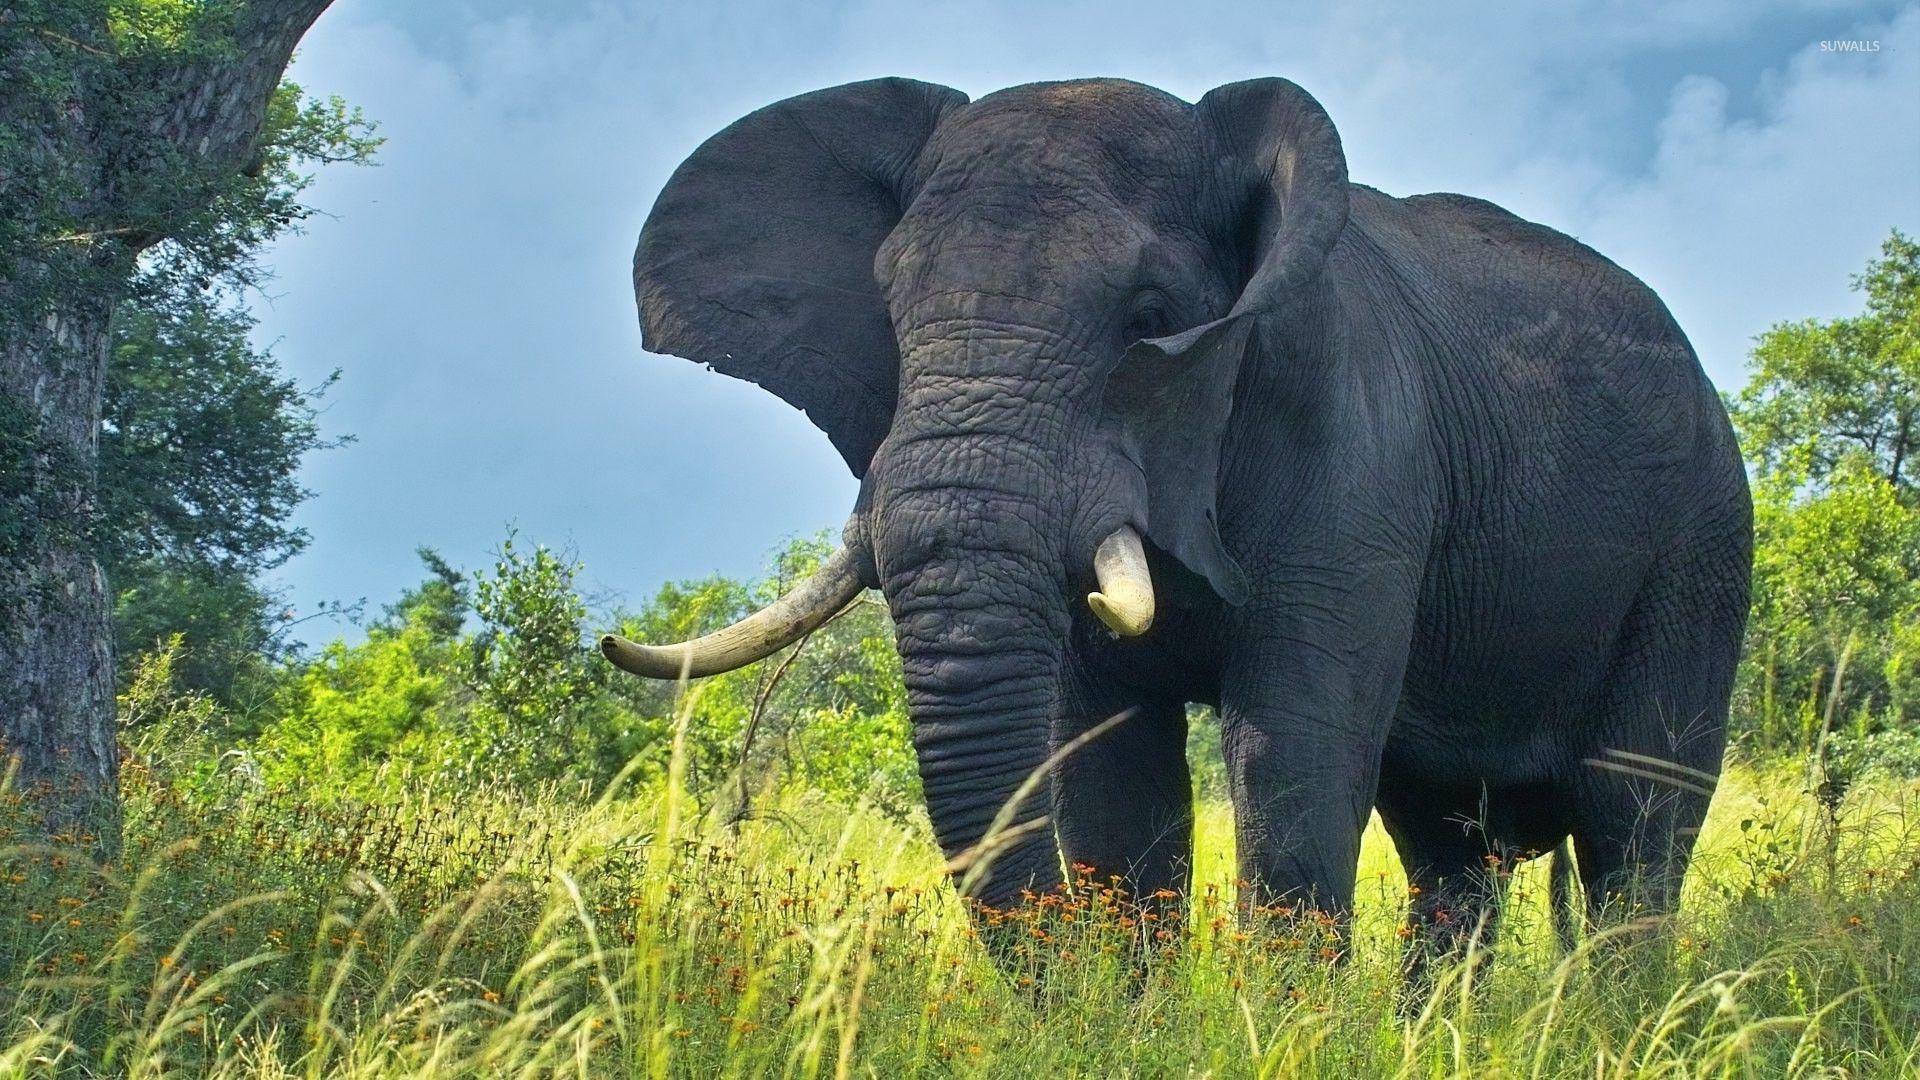 Wallpaper download elephant - Elephant Under A Tree Wallpaper